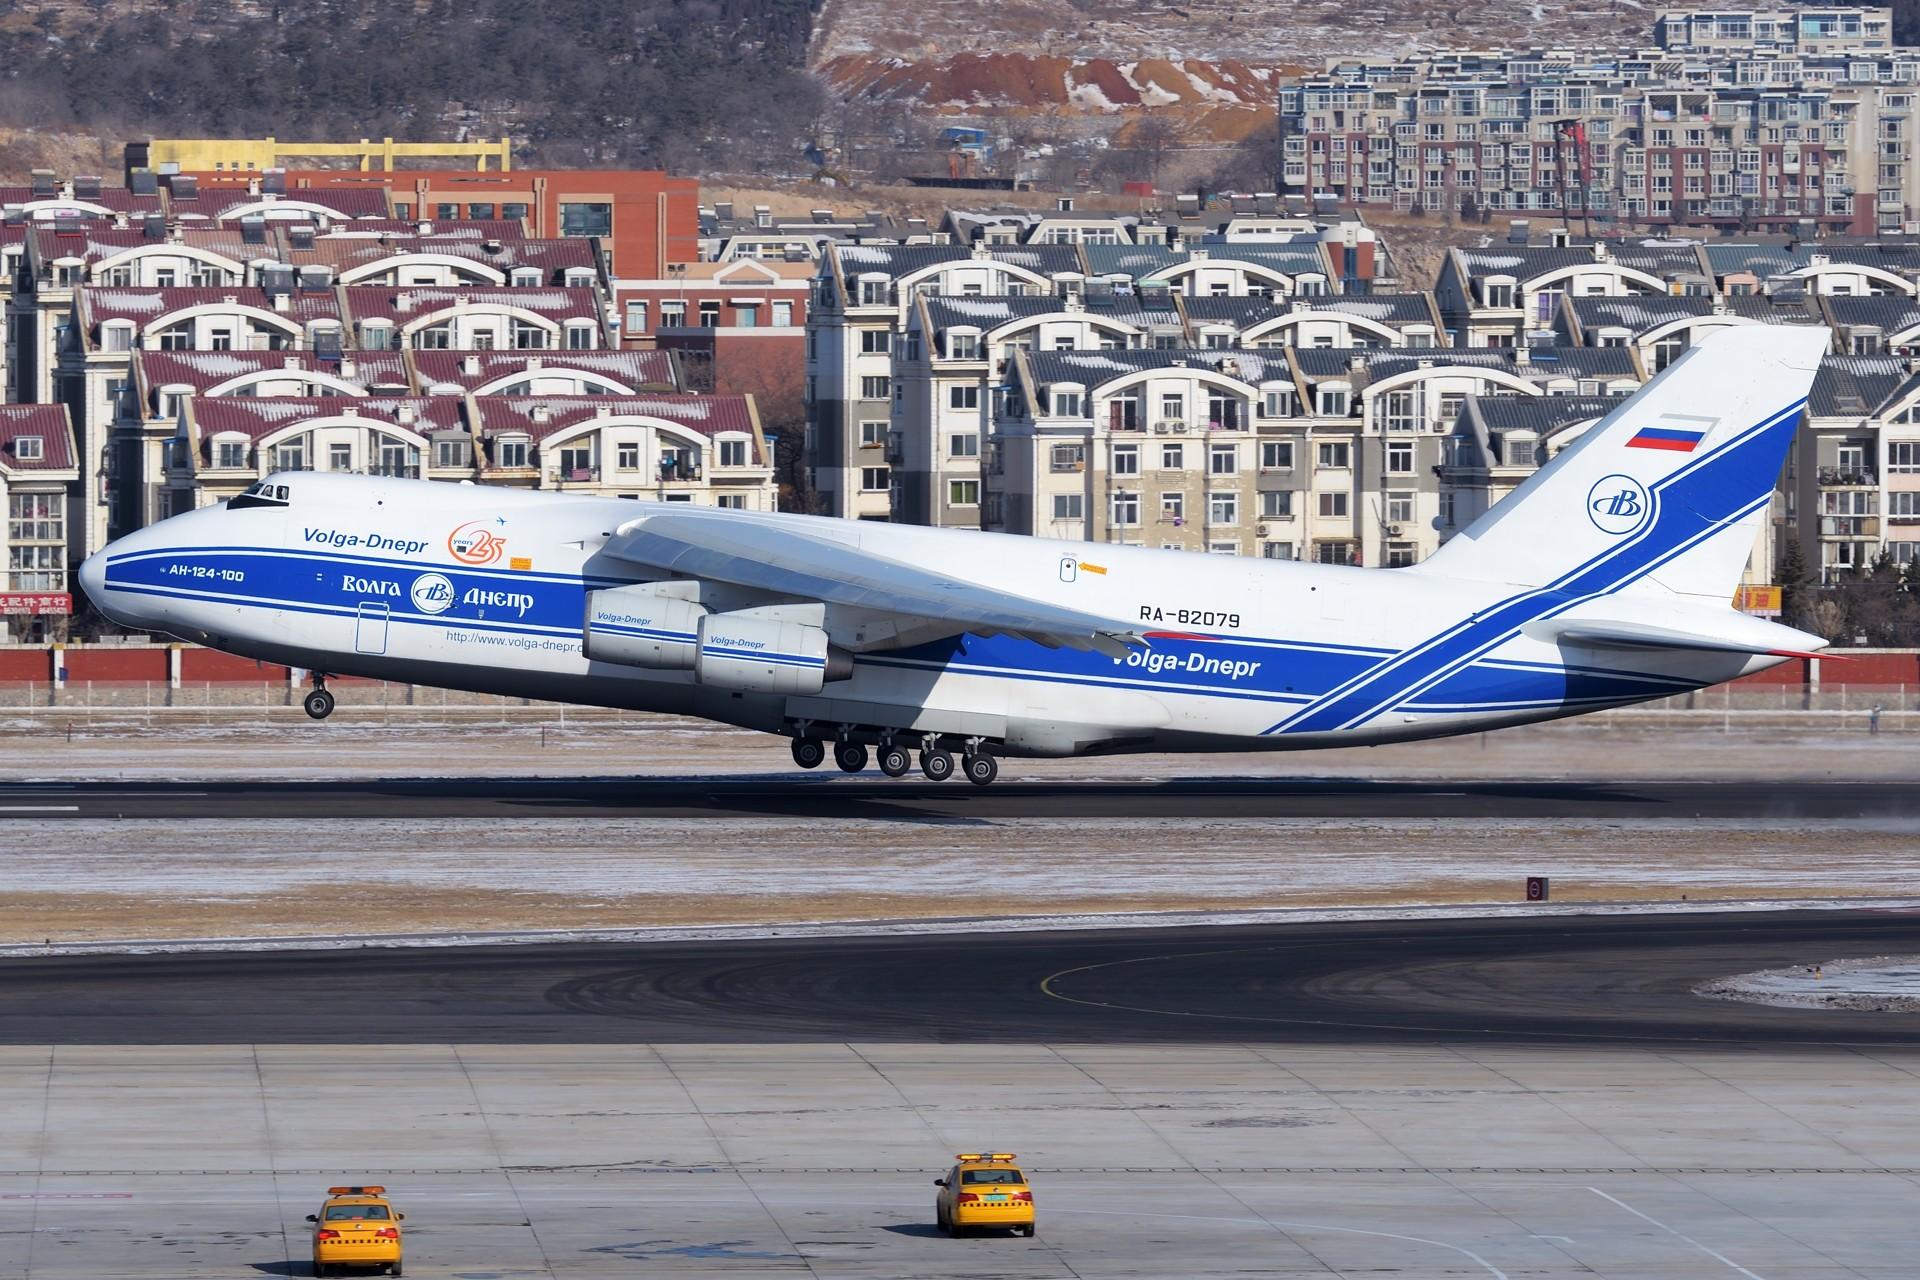 Re:★[DLC]一点有趣的事情(持续更新中)★ ANTONOV AN-124 RA-82079 中国大连国际机场